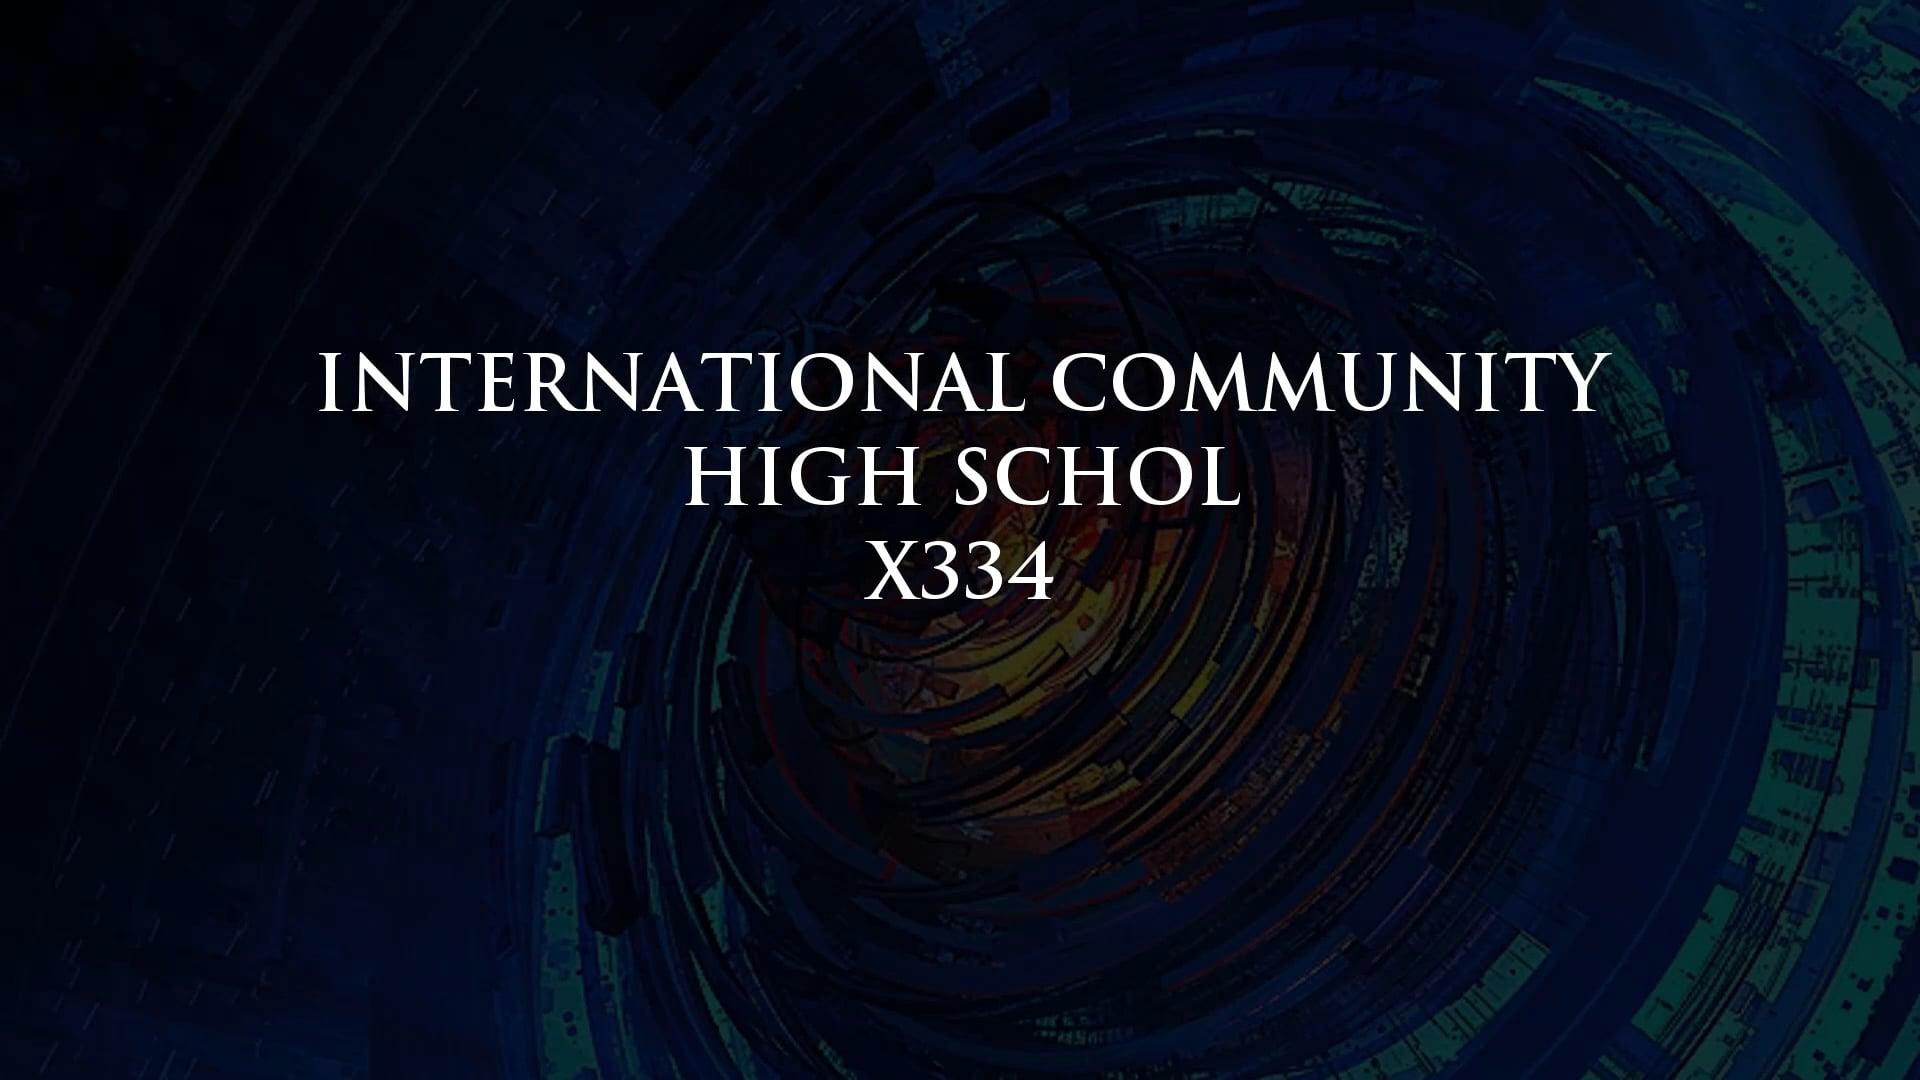 International Community High School Award (Teaching Matters)